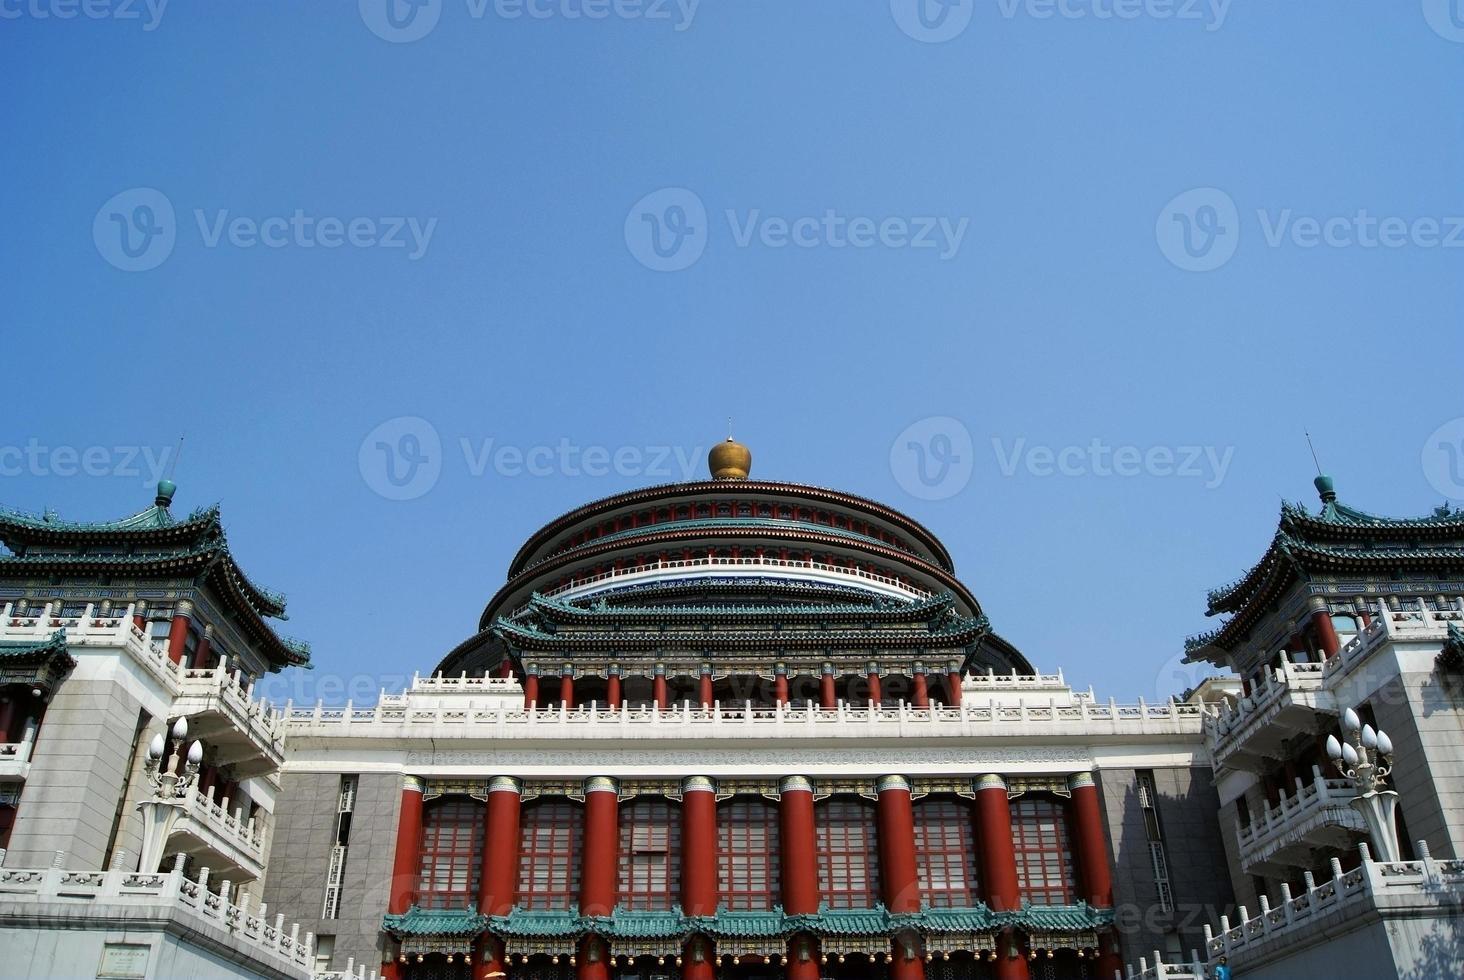 grande sala della gente, Chongqing, Cina foto